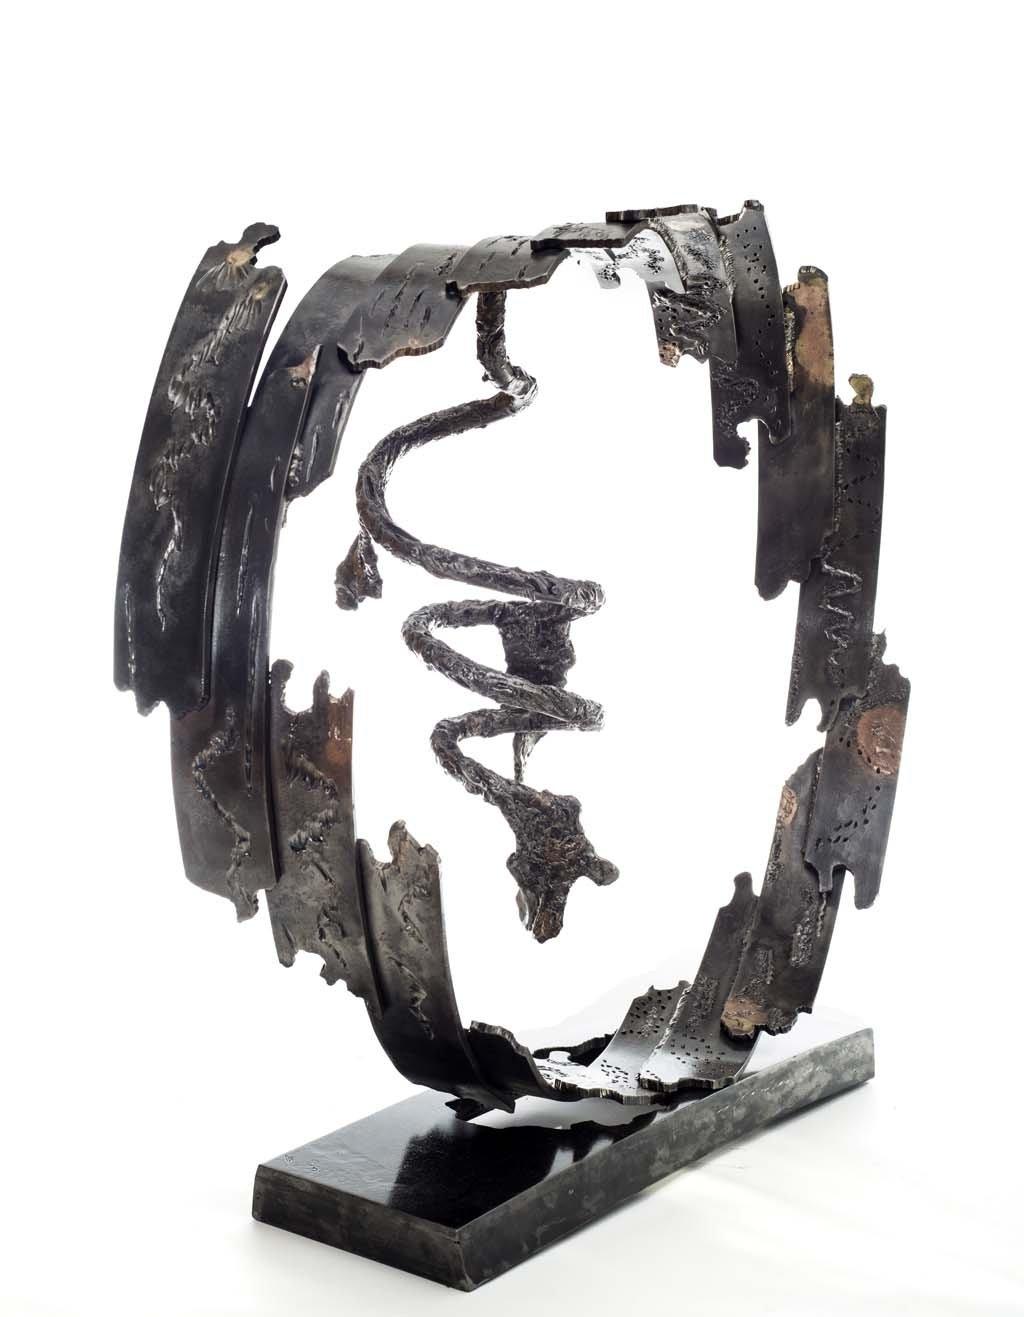 Insights VII   2014   Iron & brass sculpture   85x96x40 cm   Rami Ater